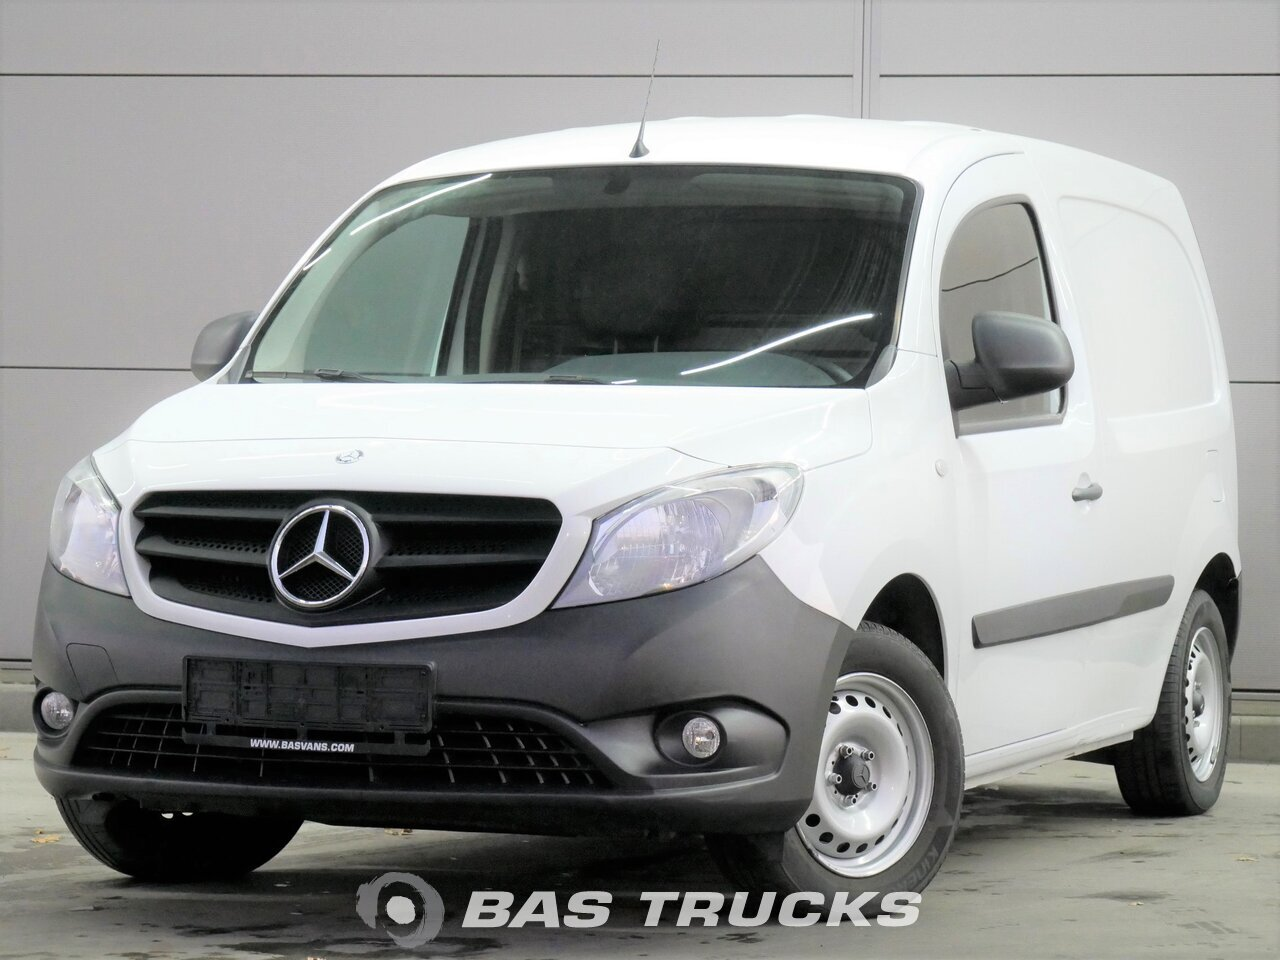 mercedes citan light commercial vehicle euro norm 0 9400 bas trucks. Black Bedroom Furniture Sets. Home Design Ideas